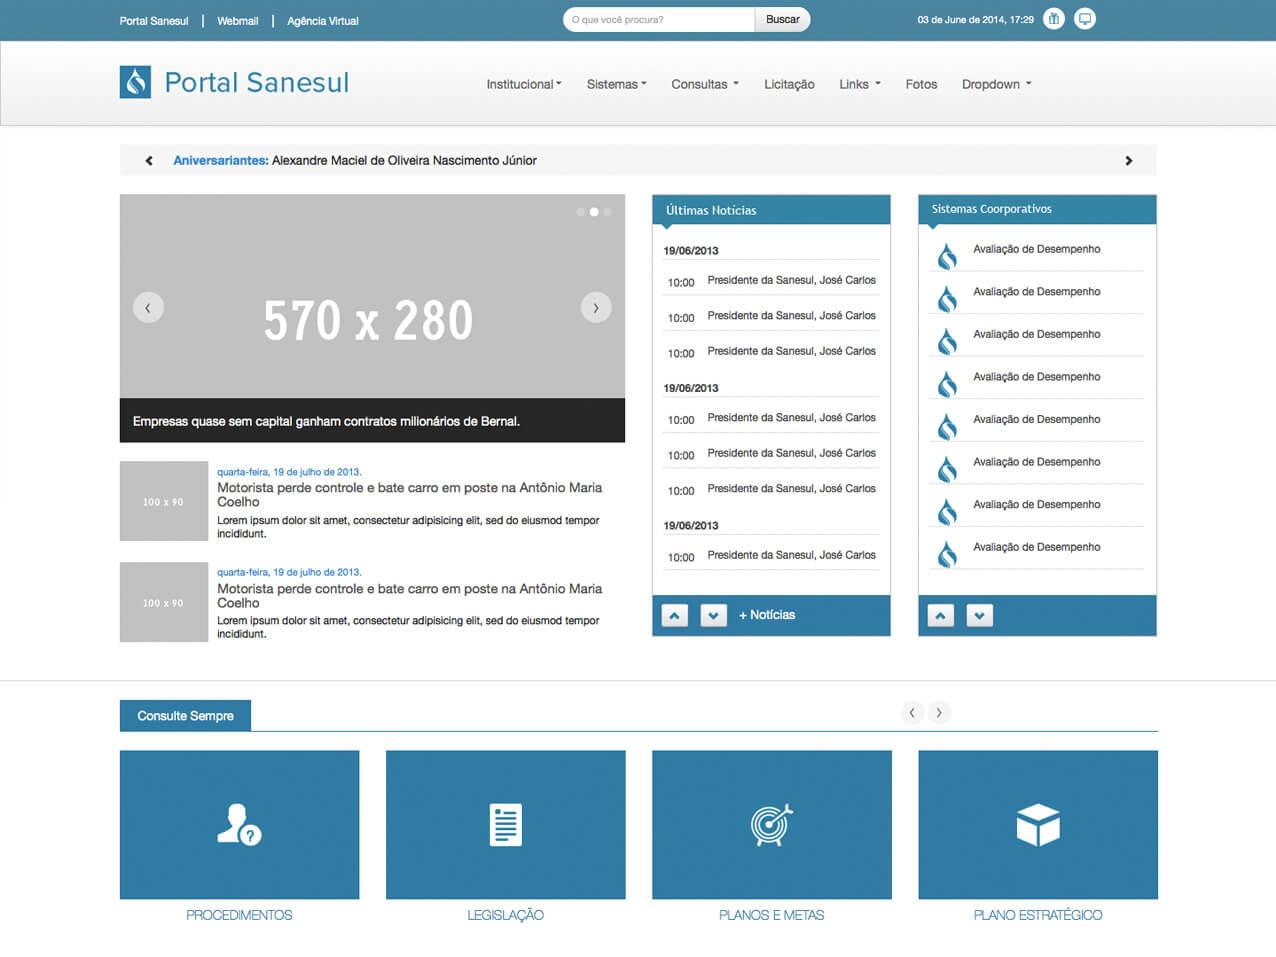 portal-sanesul-screenshot